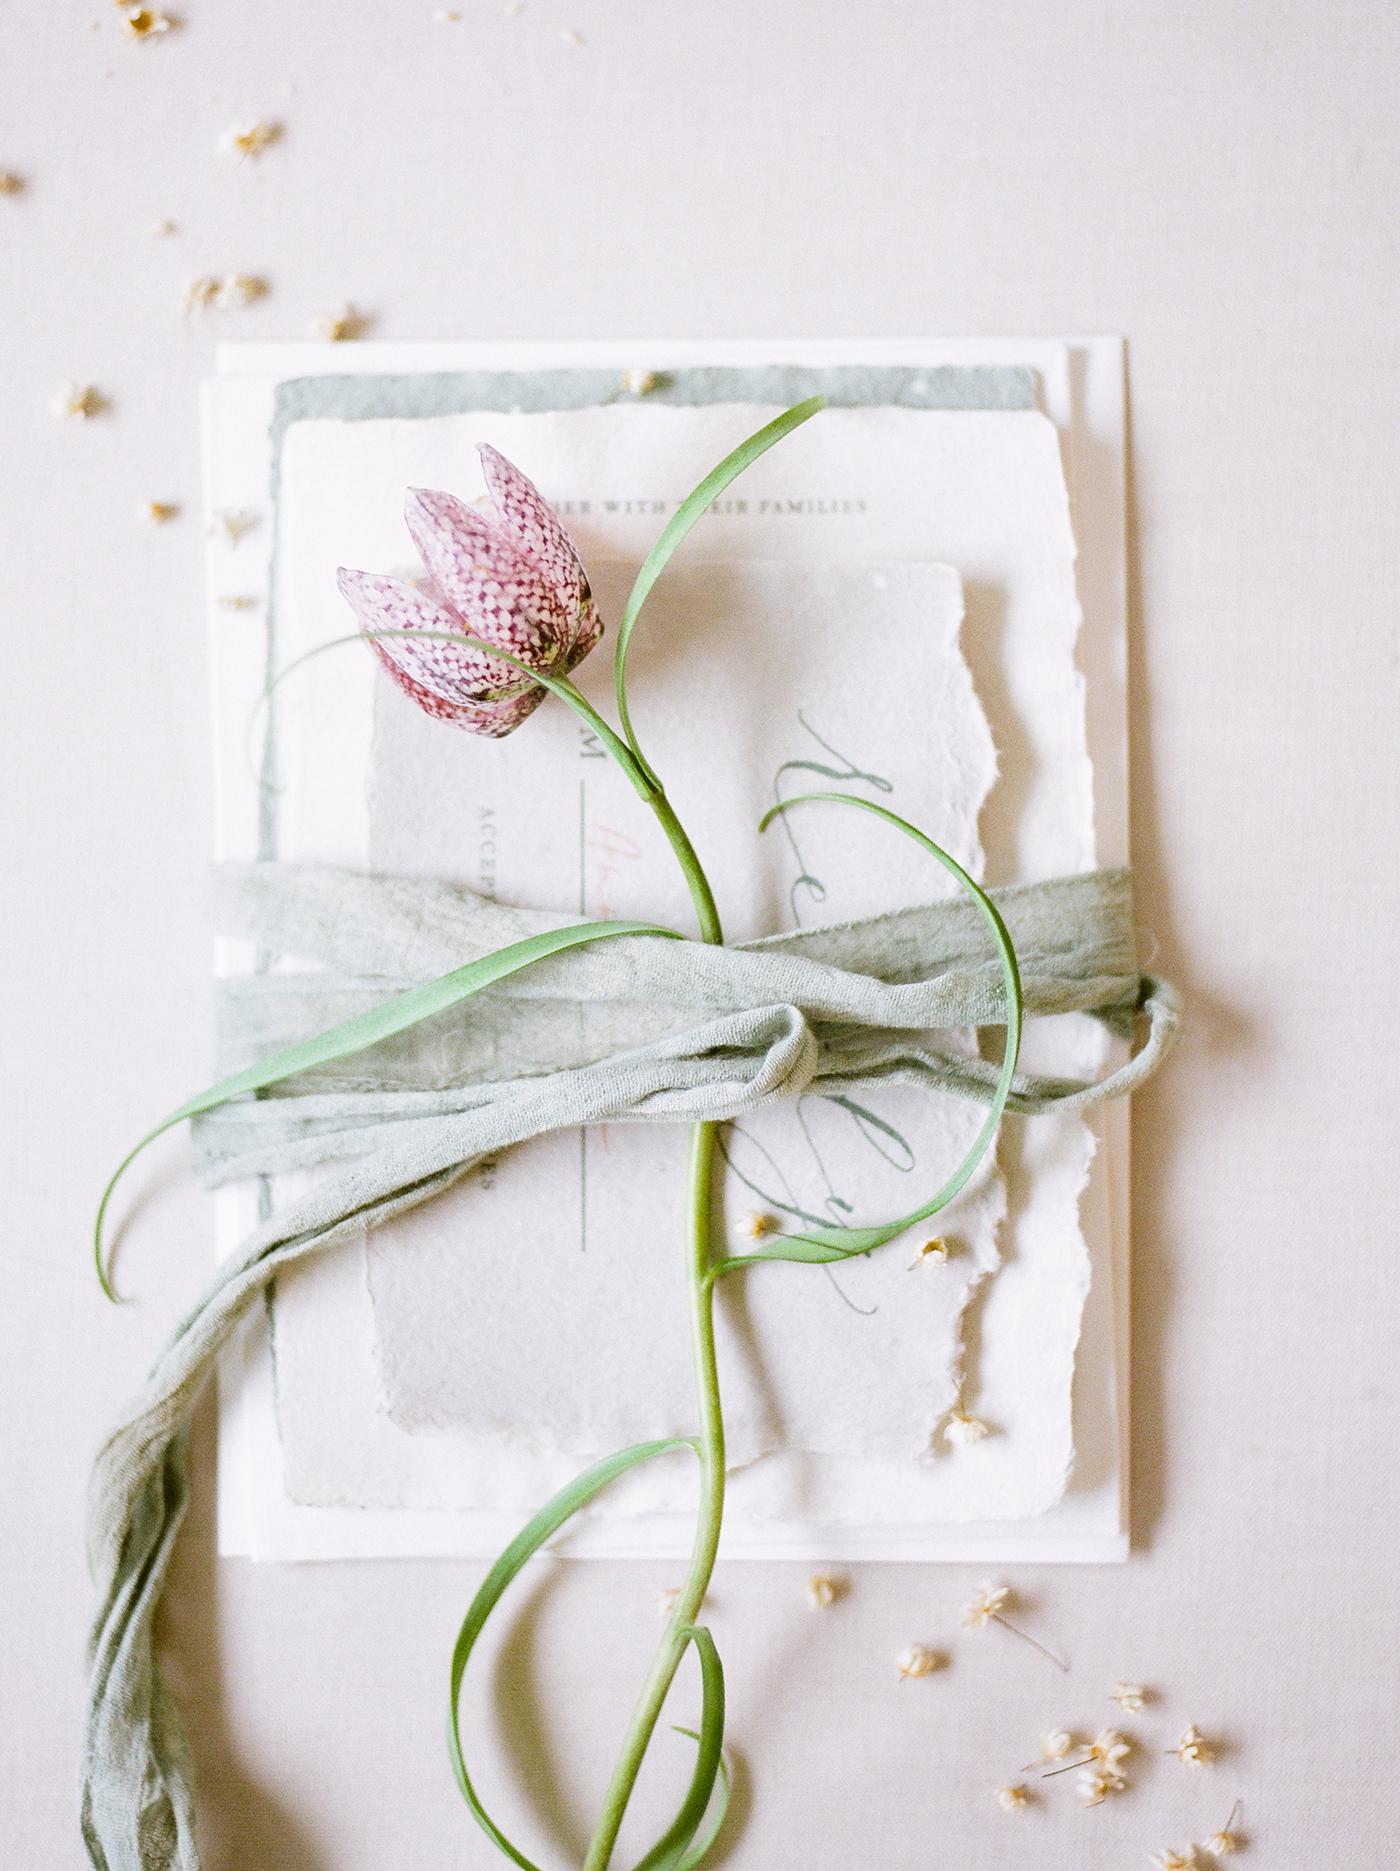 Wedding Floral Design Dallas - Olive Grove Design - Mimimalist Fall Wedding - 00183.jpg